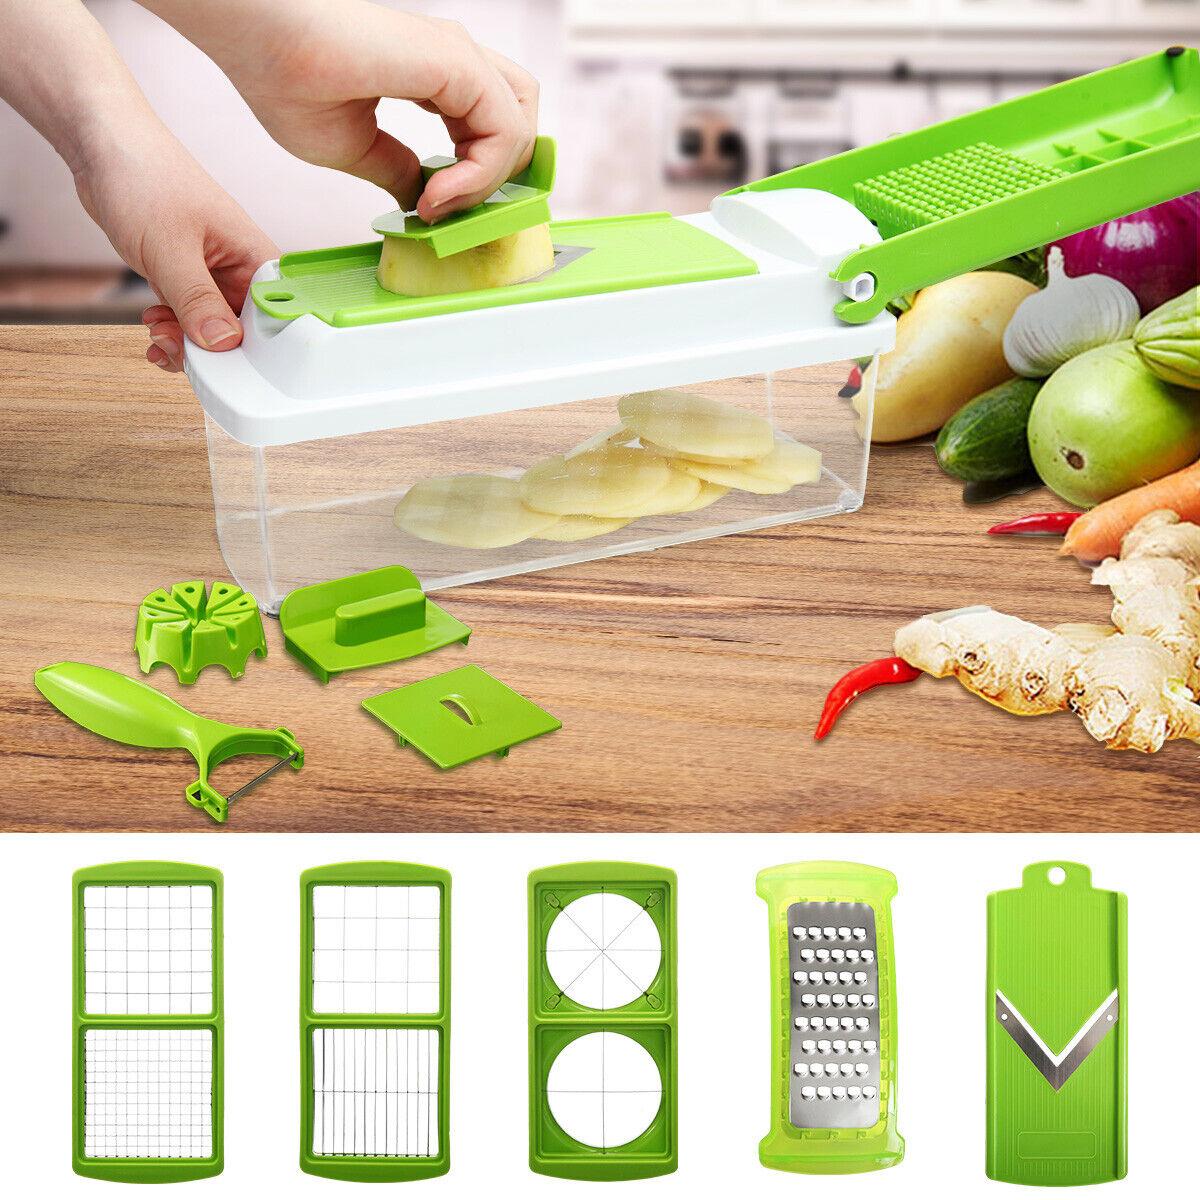 12 PC Kitchen Super Slicer Plus Vegetable Fruit Peeler Dicer Cutter Chopper